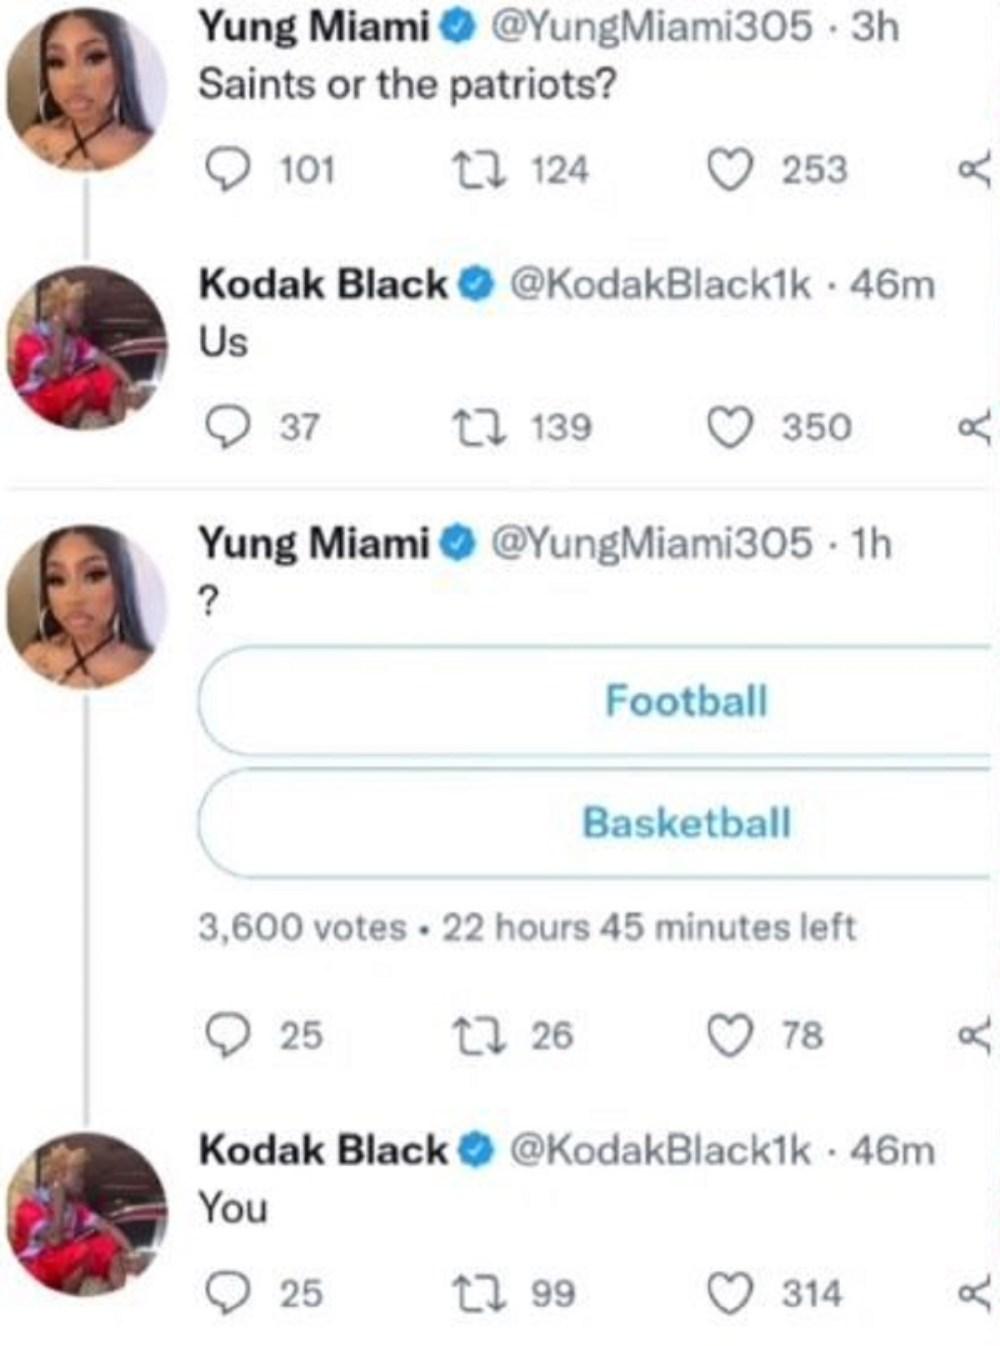 Kodak Black tells Yung Miami he wants her on Twitter